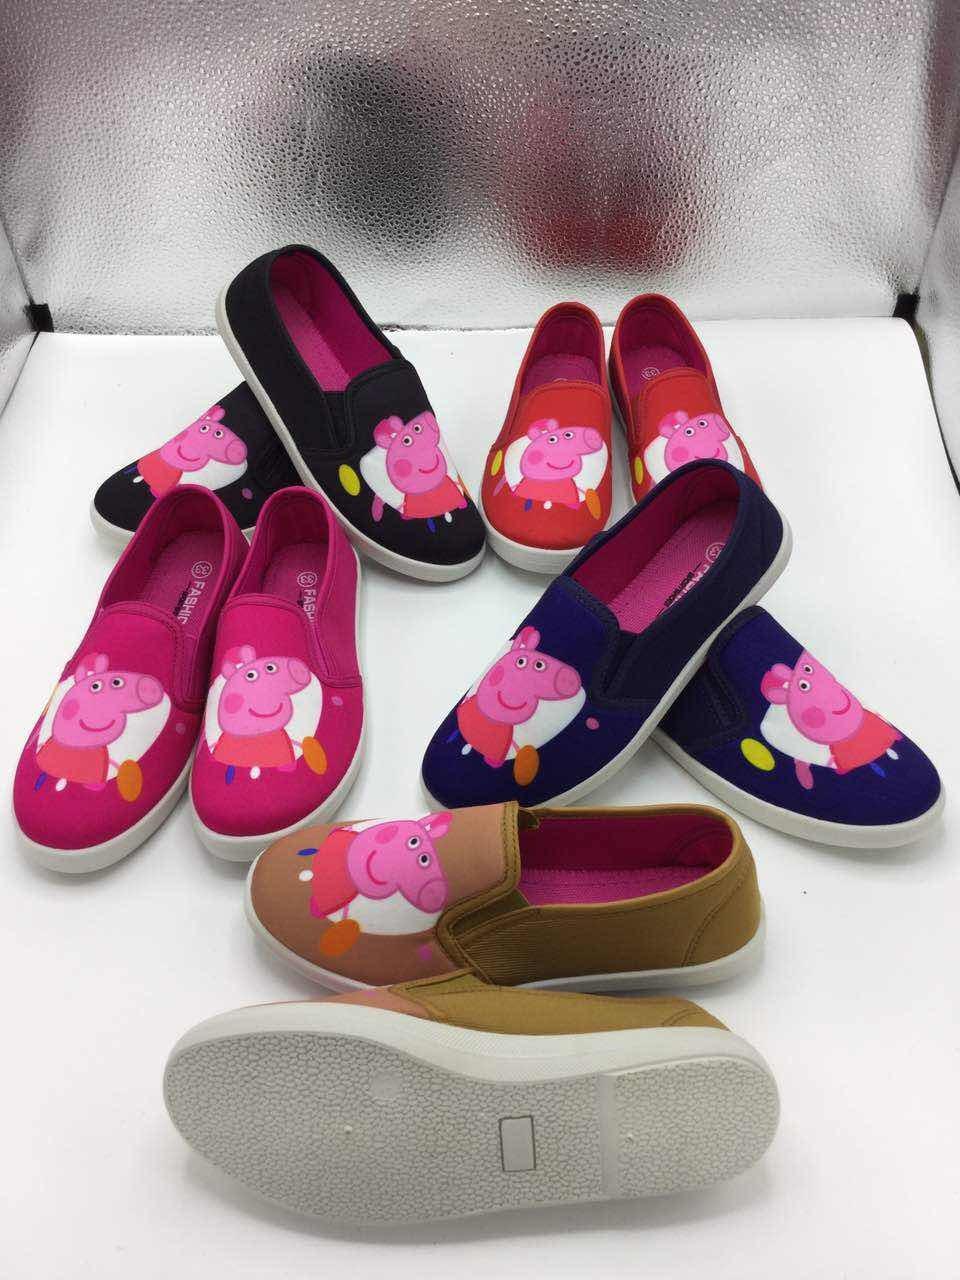 2017 New Children′s Classic Fashion 3D Print Casual Canvas Shoes